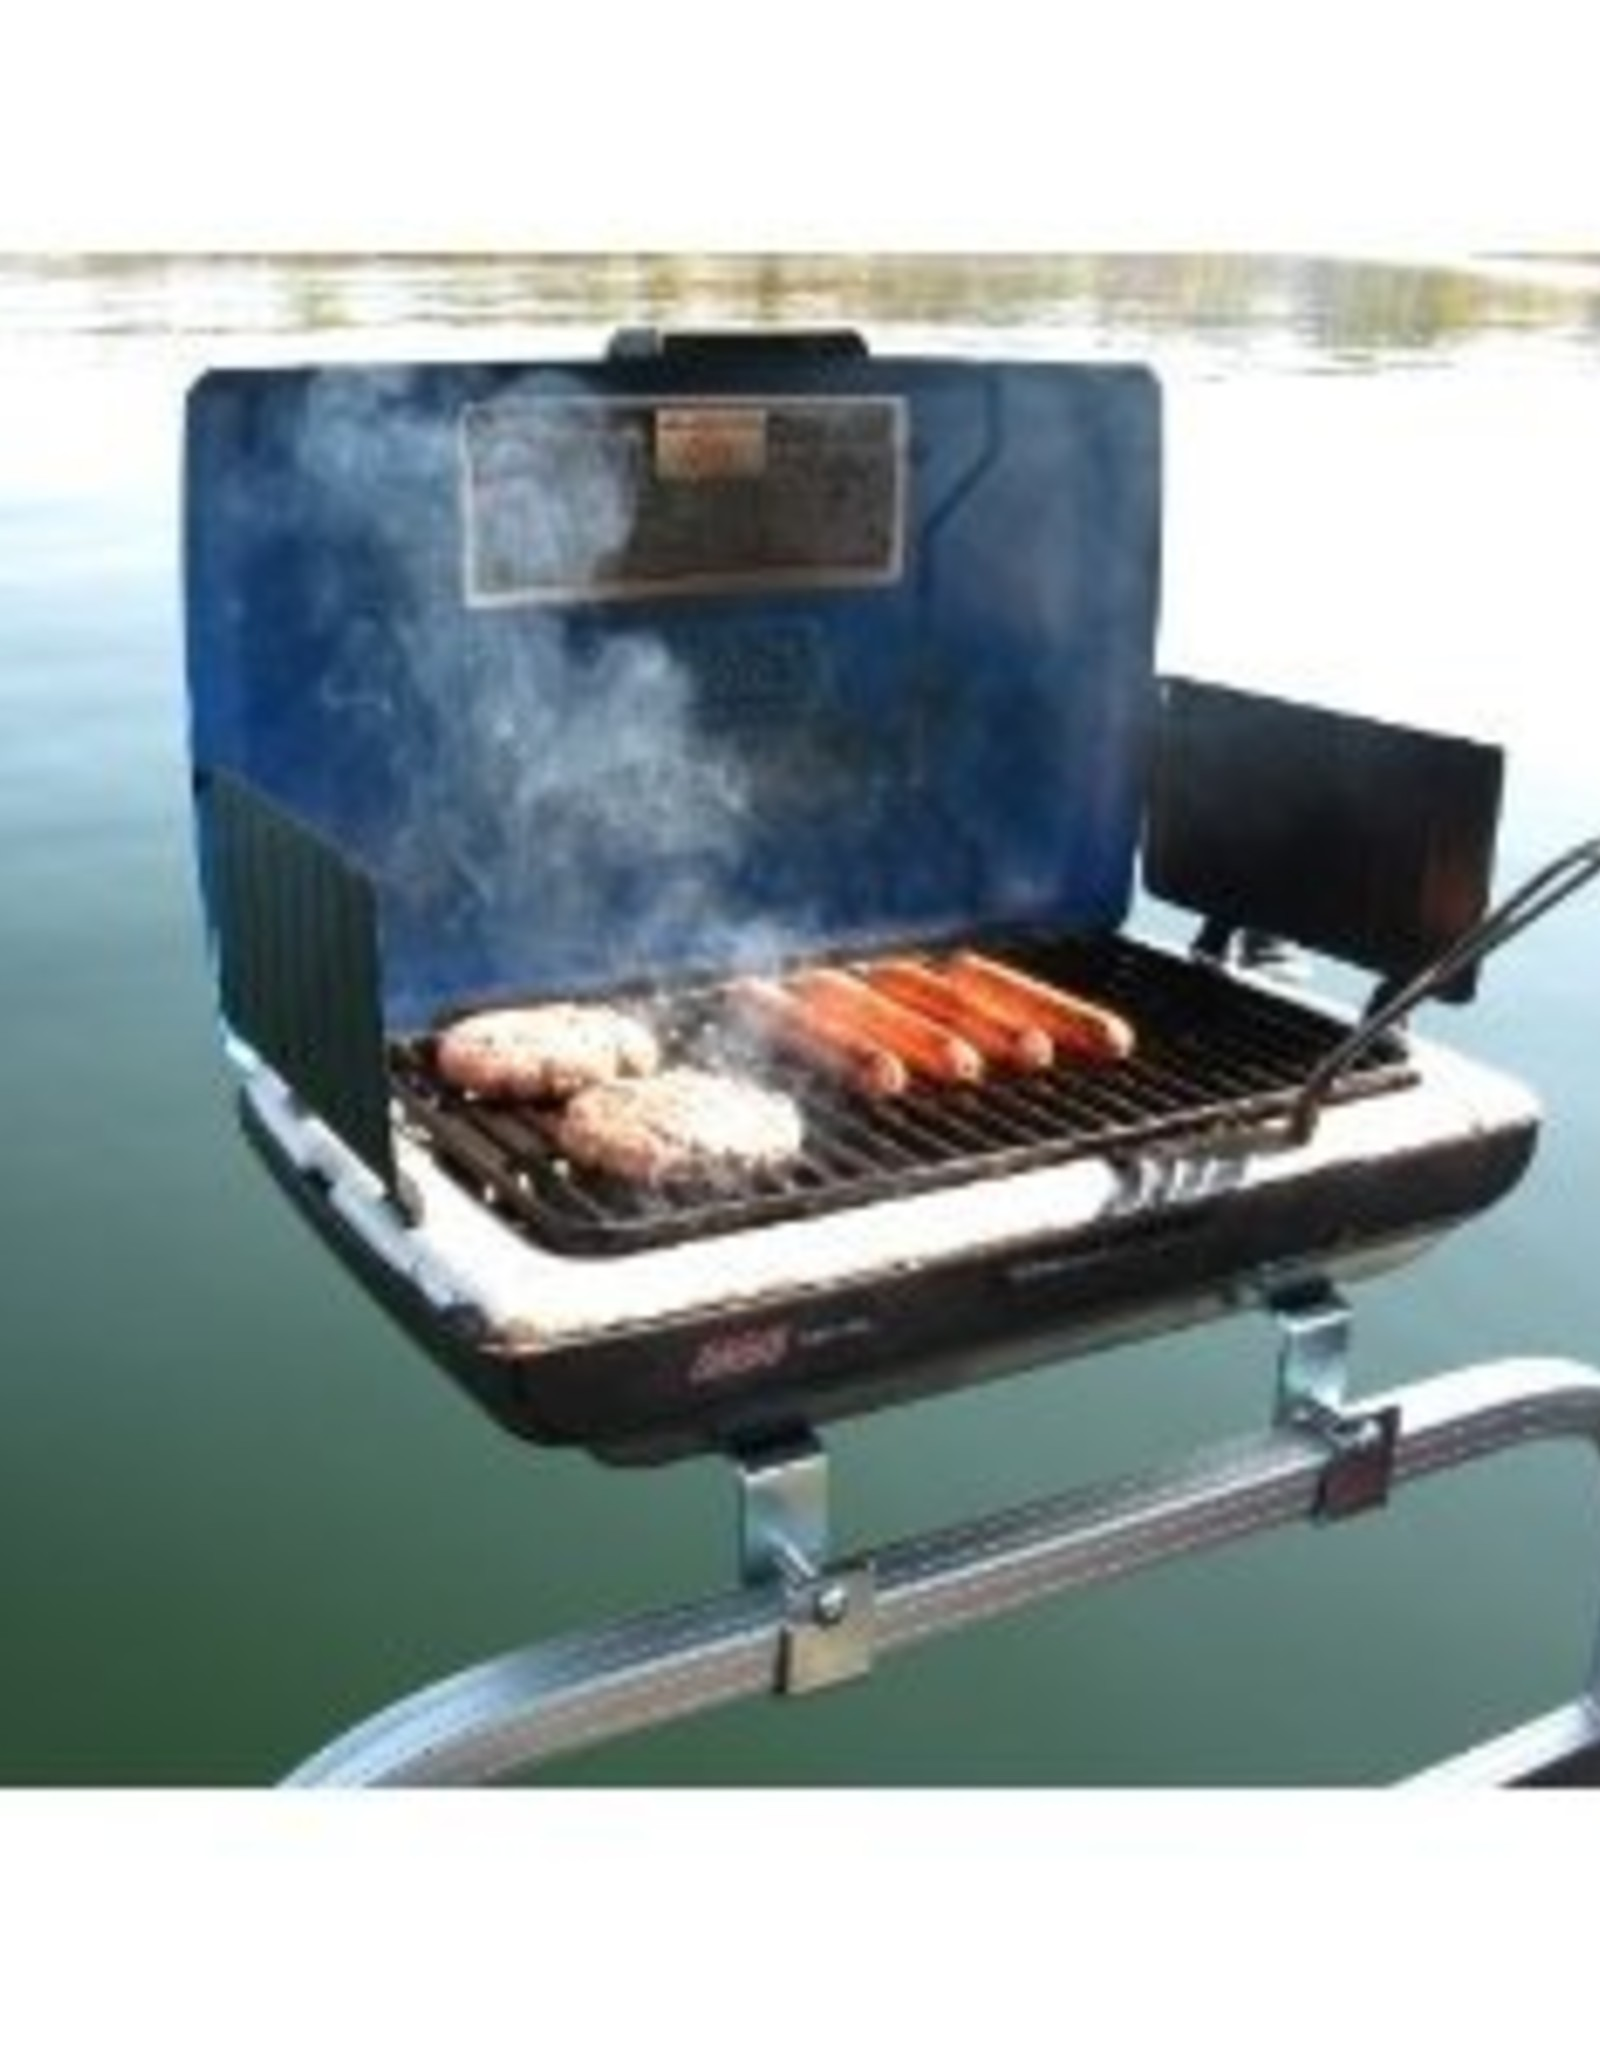 Barbecue op de sloep - Copy